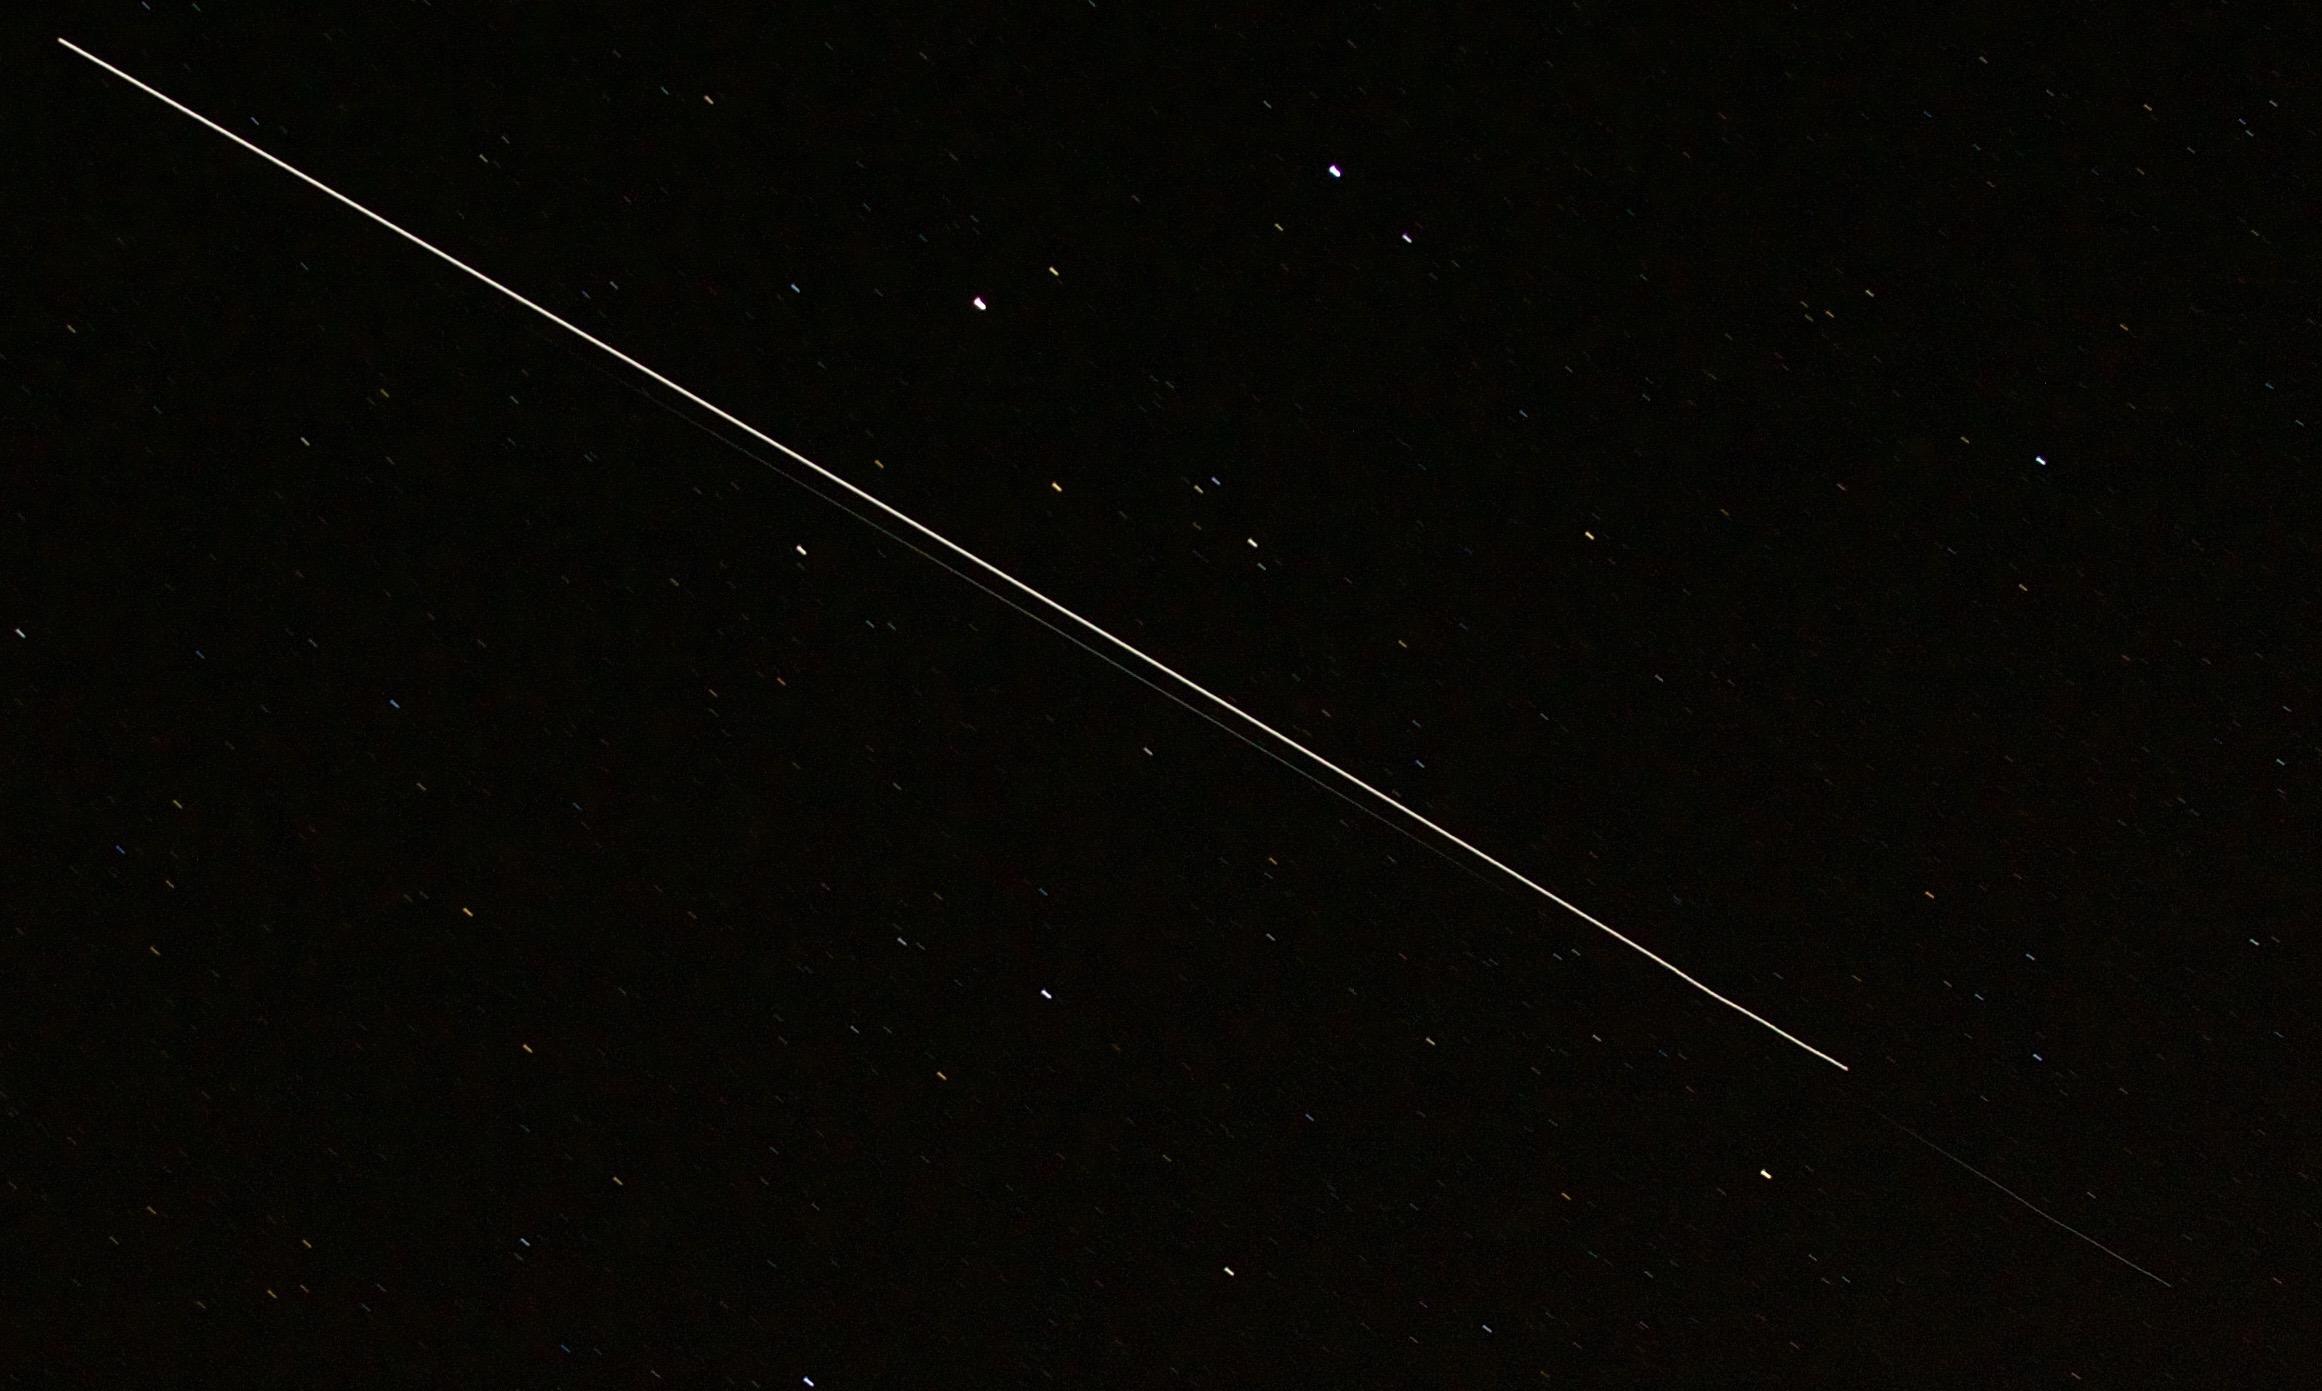 ISS and Dragon capsule flying overhead in Bellingham, WA on April 16, 2015 (Photo credit: Matt Greenstreet)